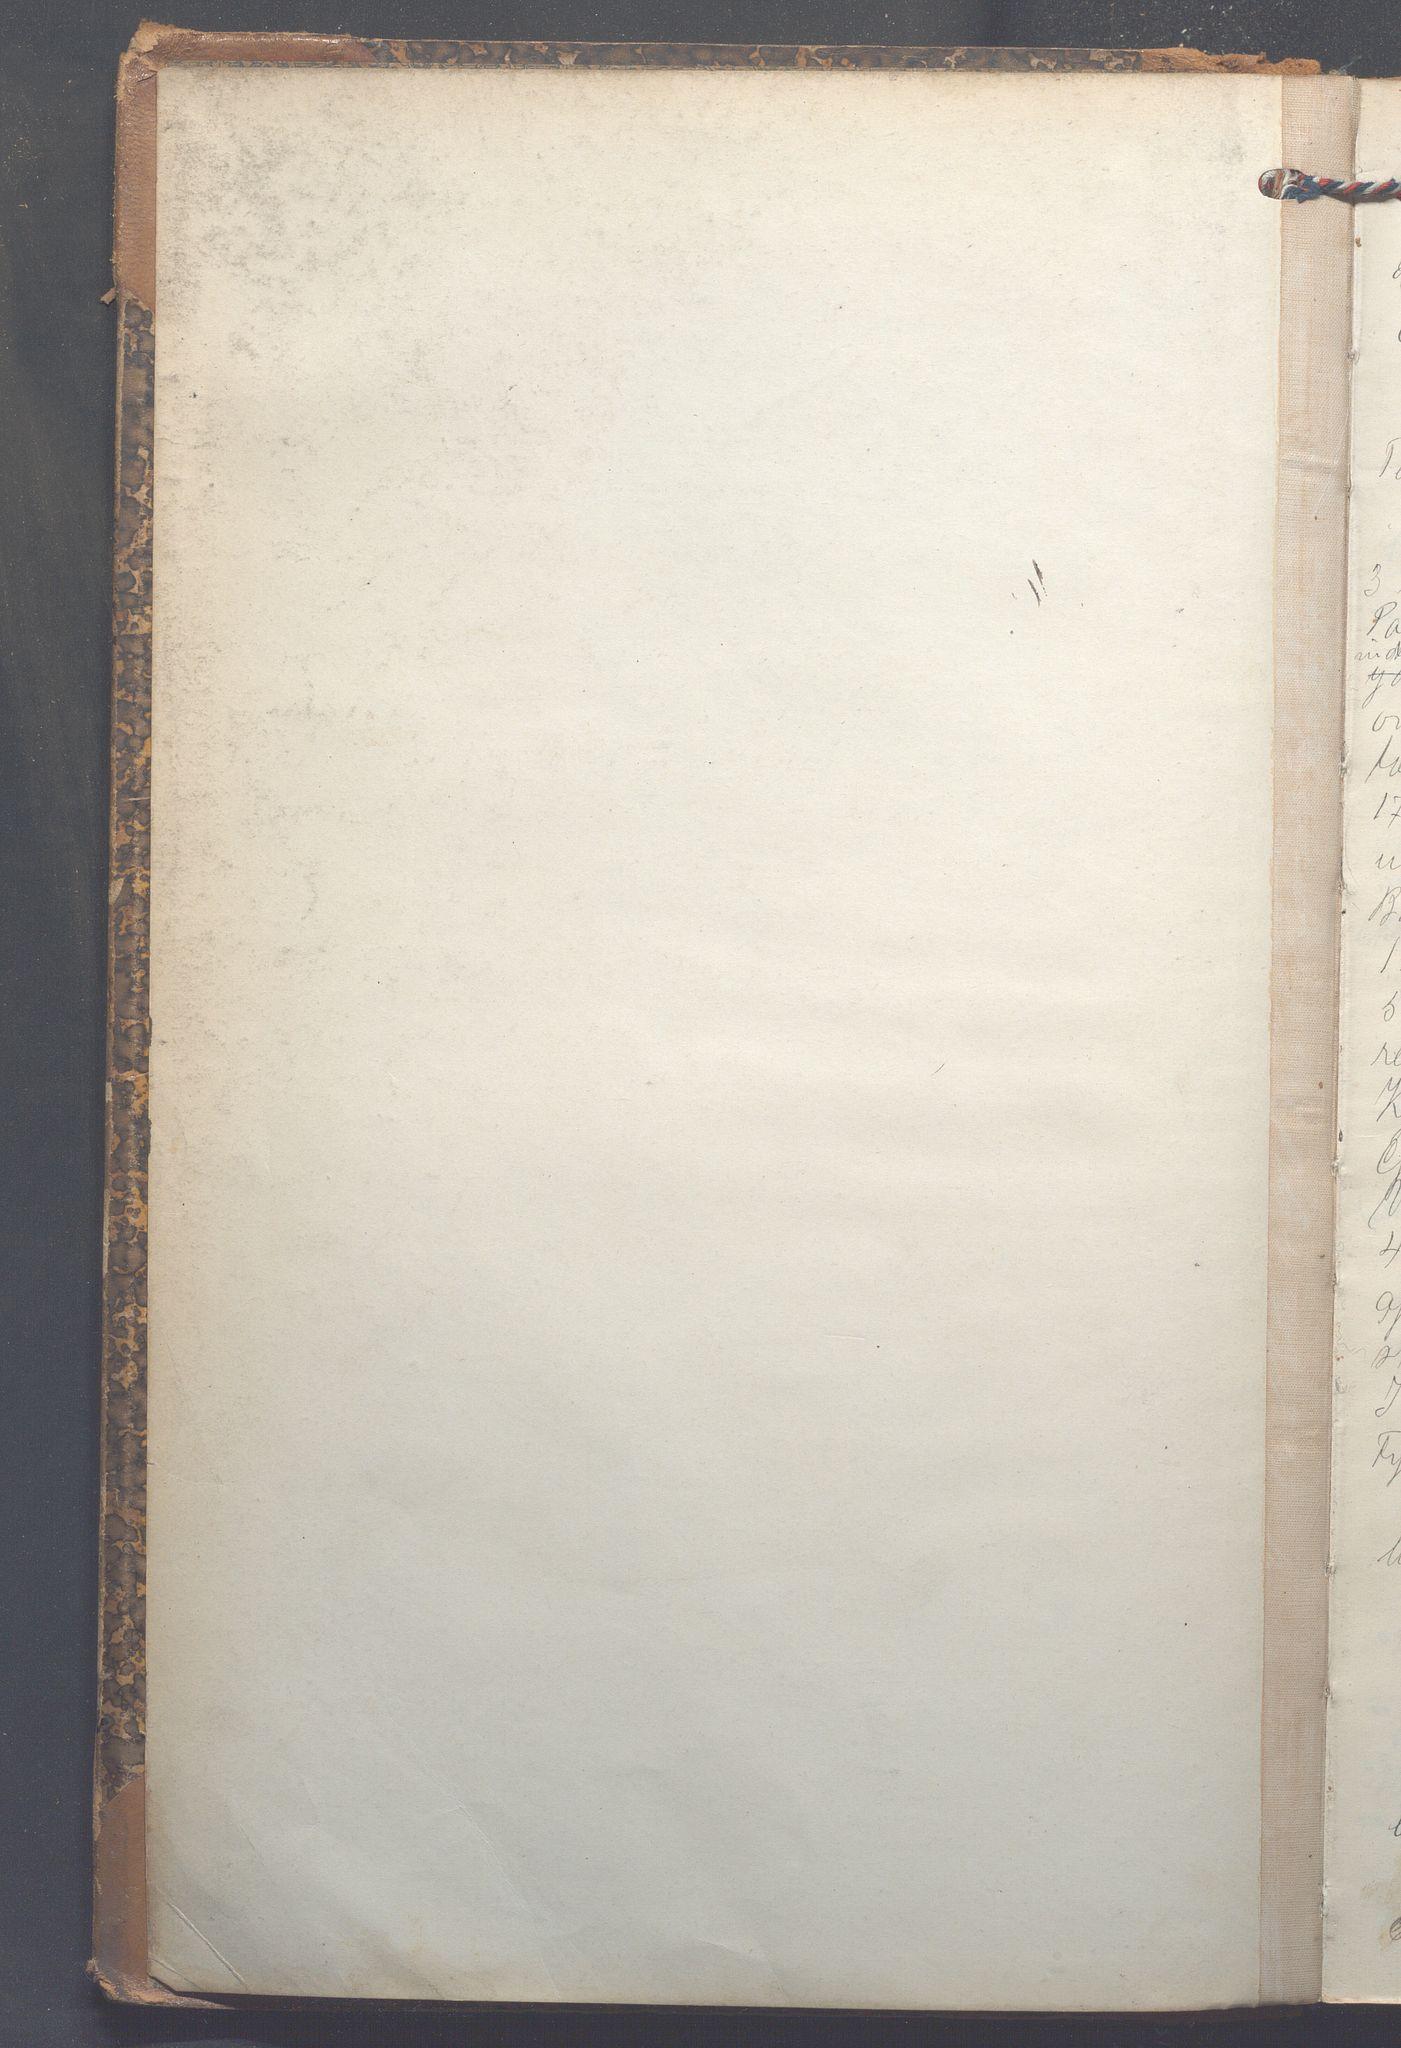 OBA, Lensmennene i Aker, F/Fa/L0011: Branntakstprotokoll, 1902-1905